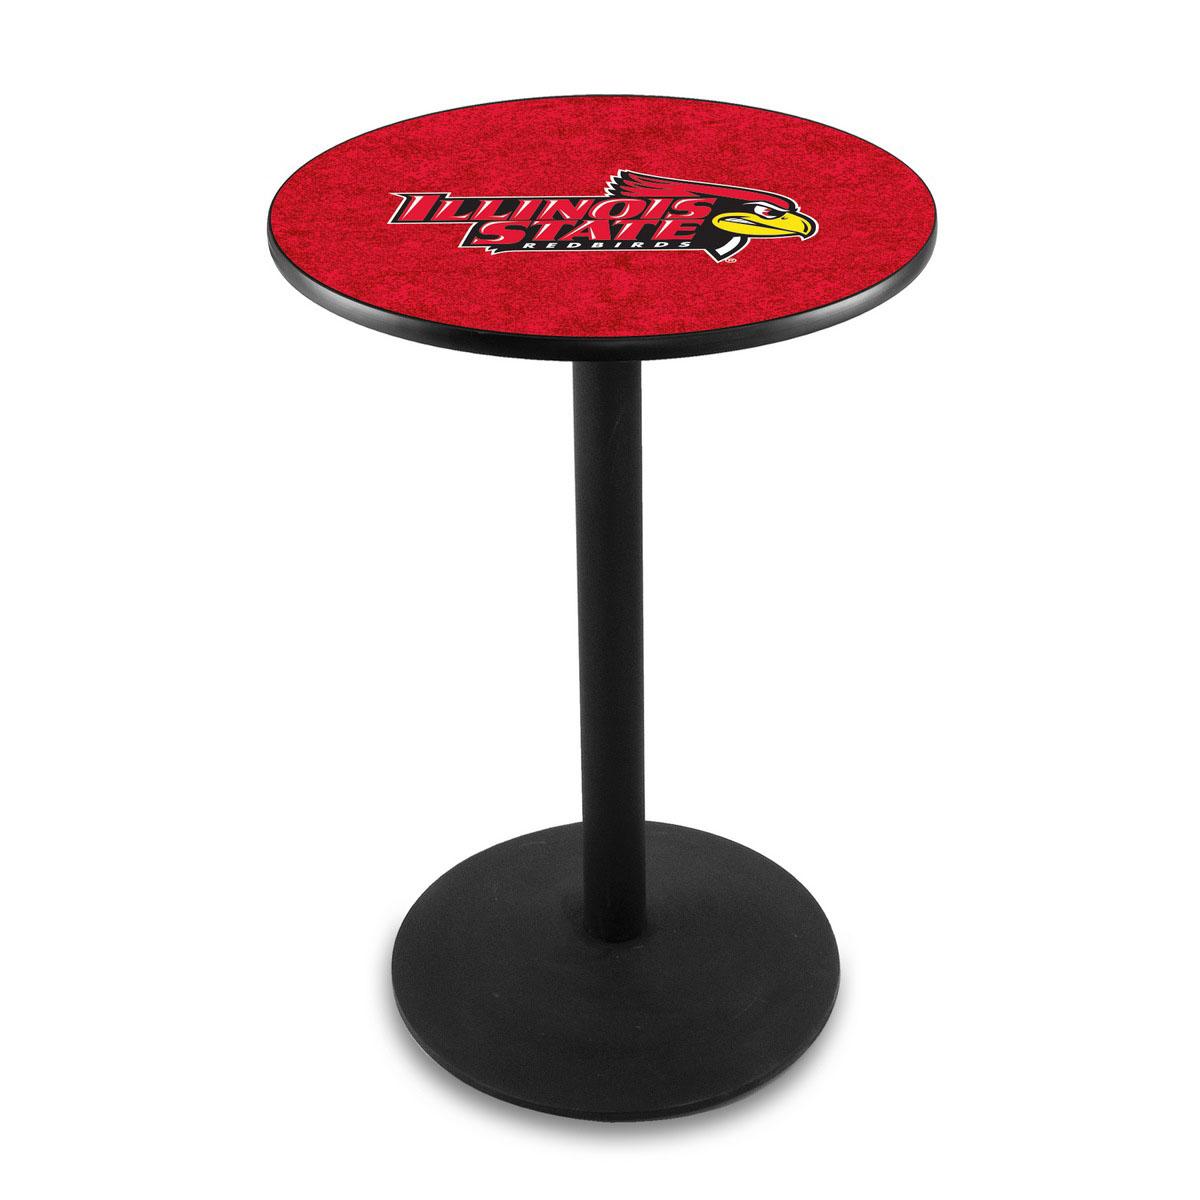 Splendid Illinois State University Logo Pub Bar Table Round Stand Product Photo